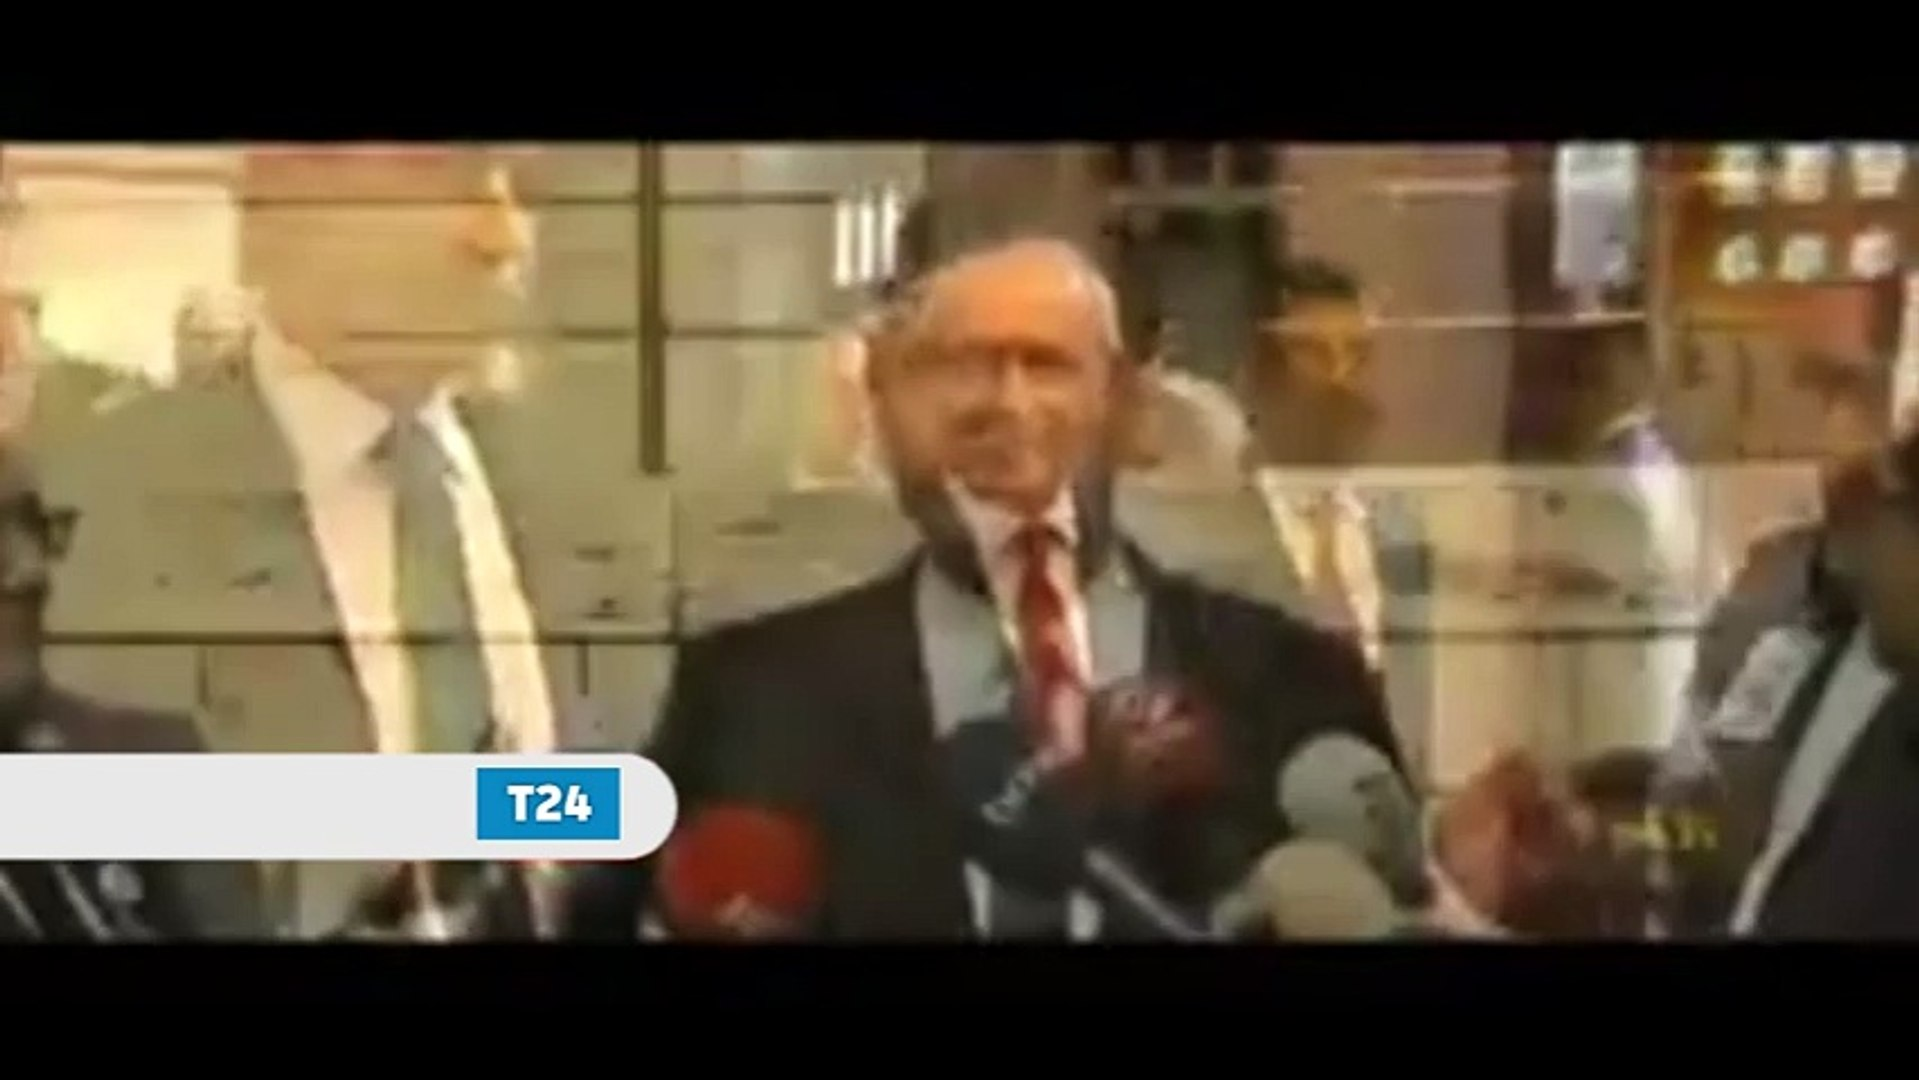 CHP'li Özel'den Başbakan'a Aleyna Tilki mesajı: Bi sussan bari